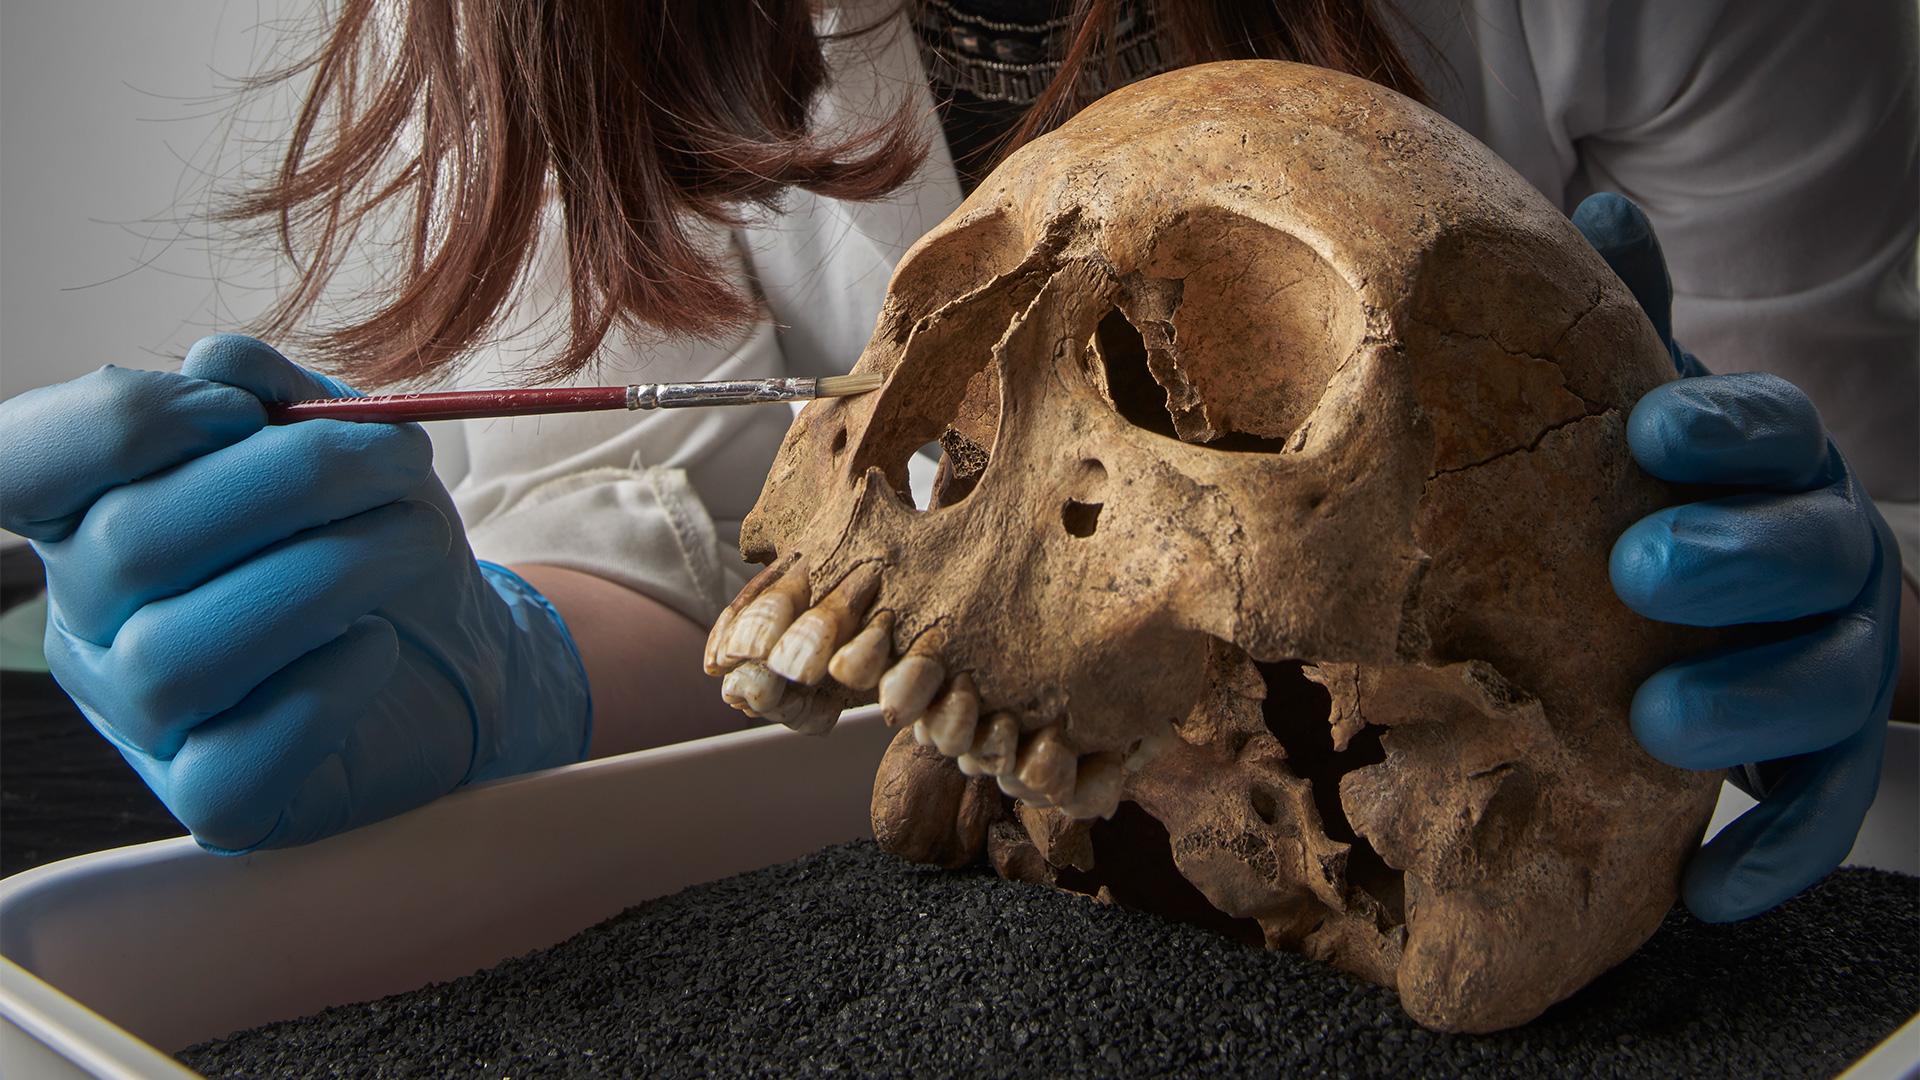 A lady examines a human skull.